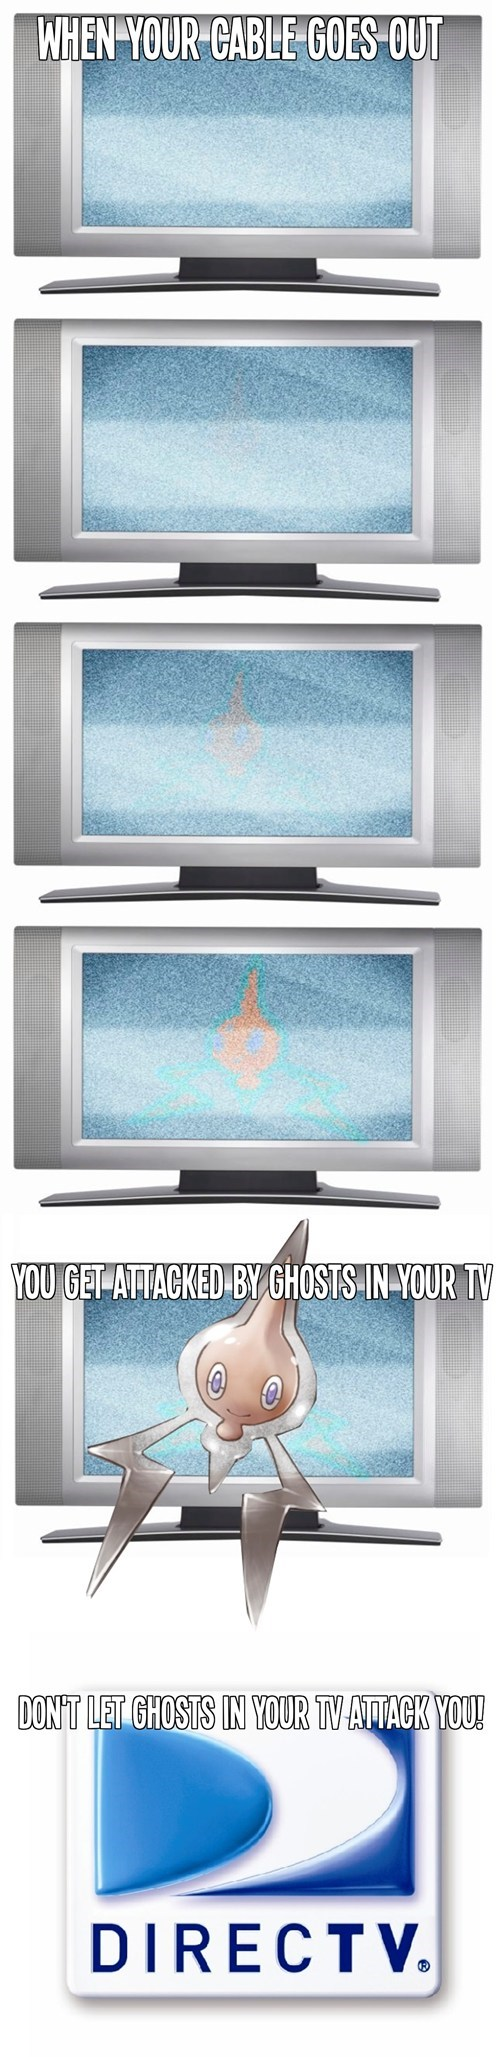 tvs rotom directv - 7677193216